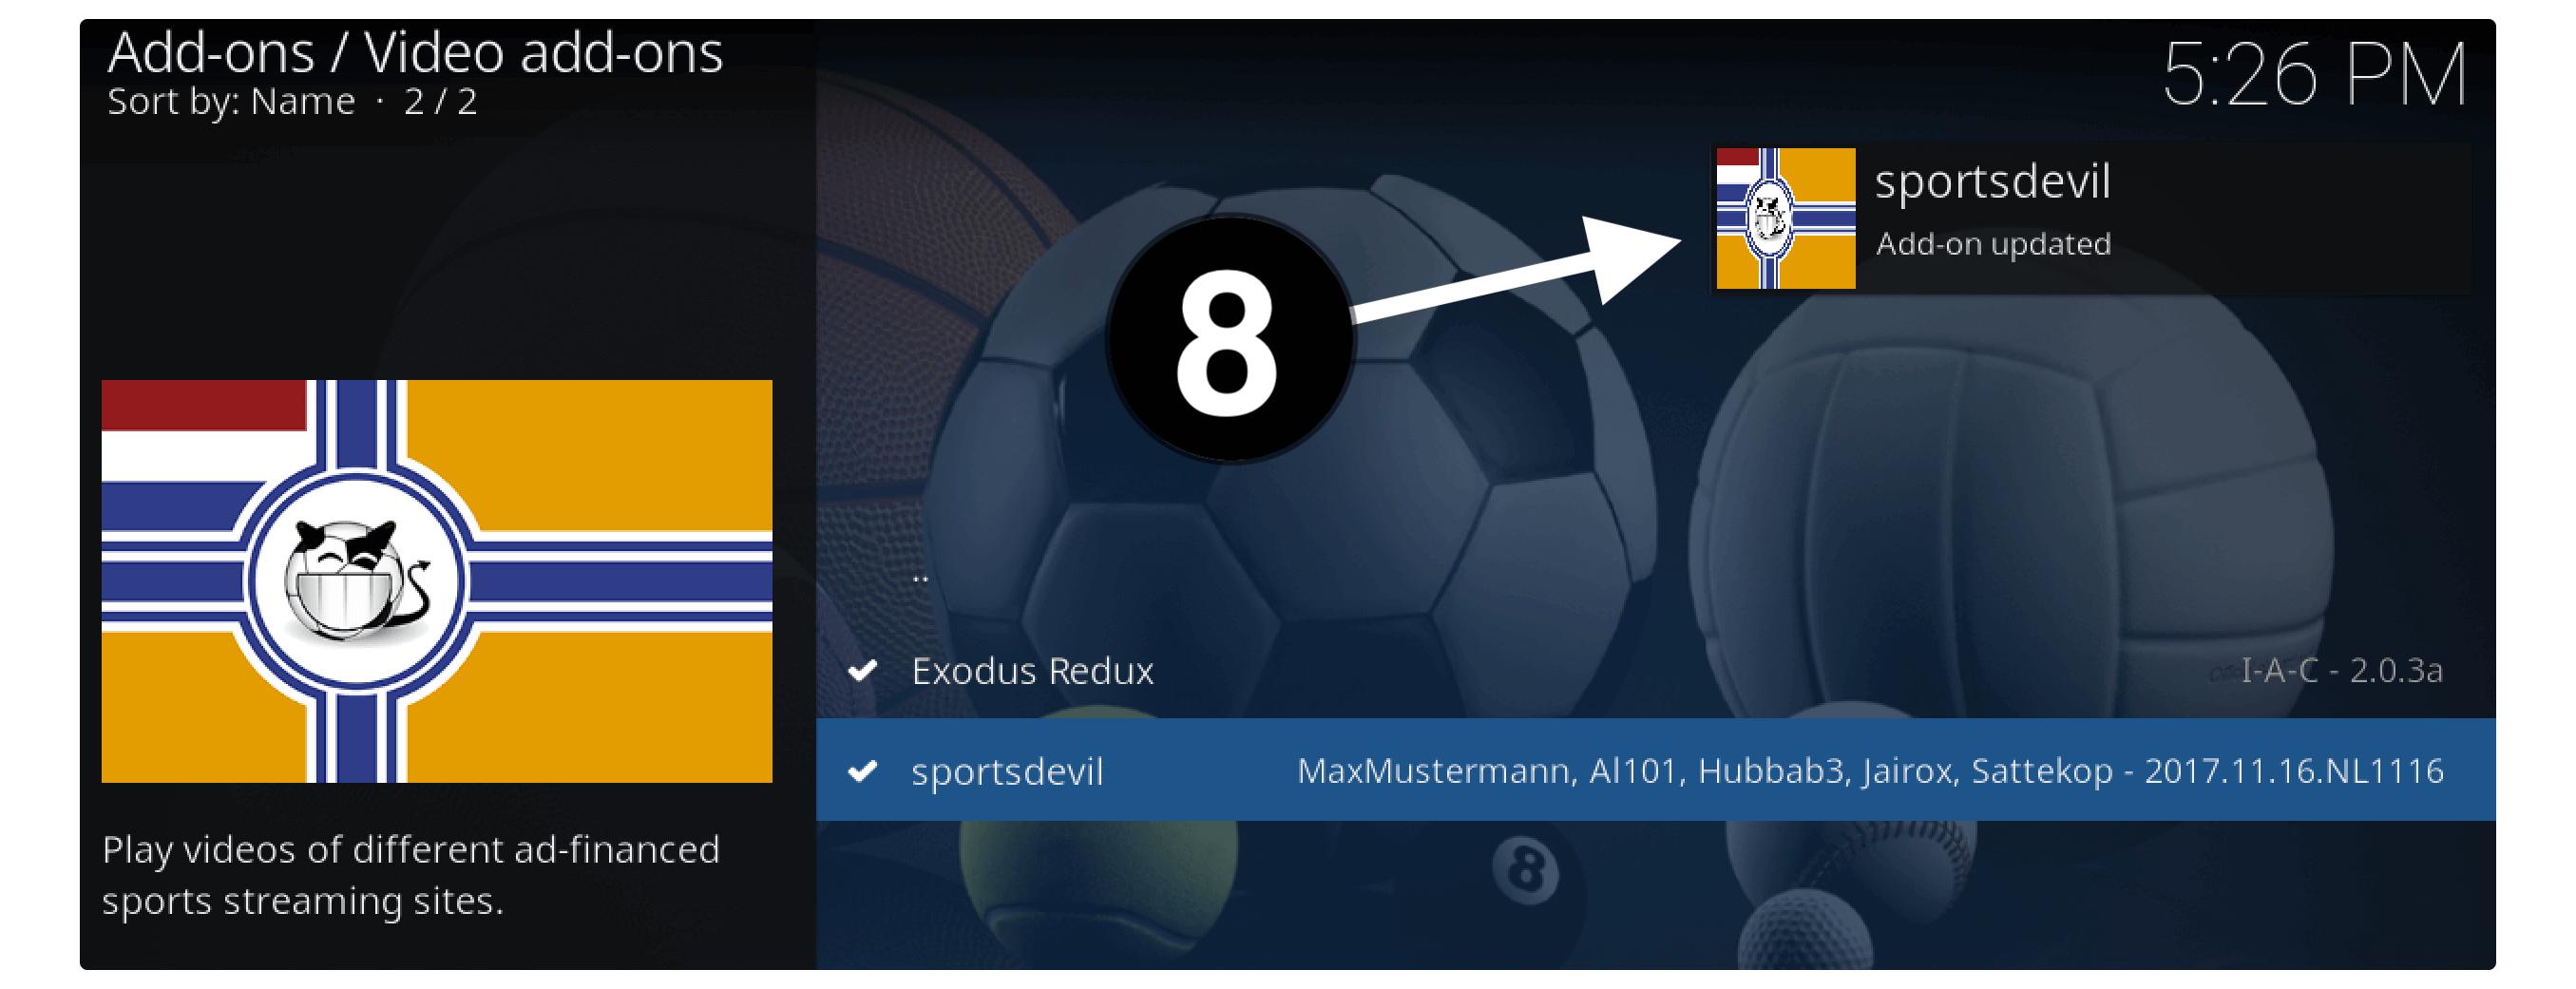 How-To-fix-Sportsdevil-Not-Working-on-Kodi